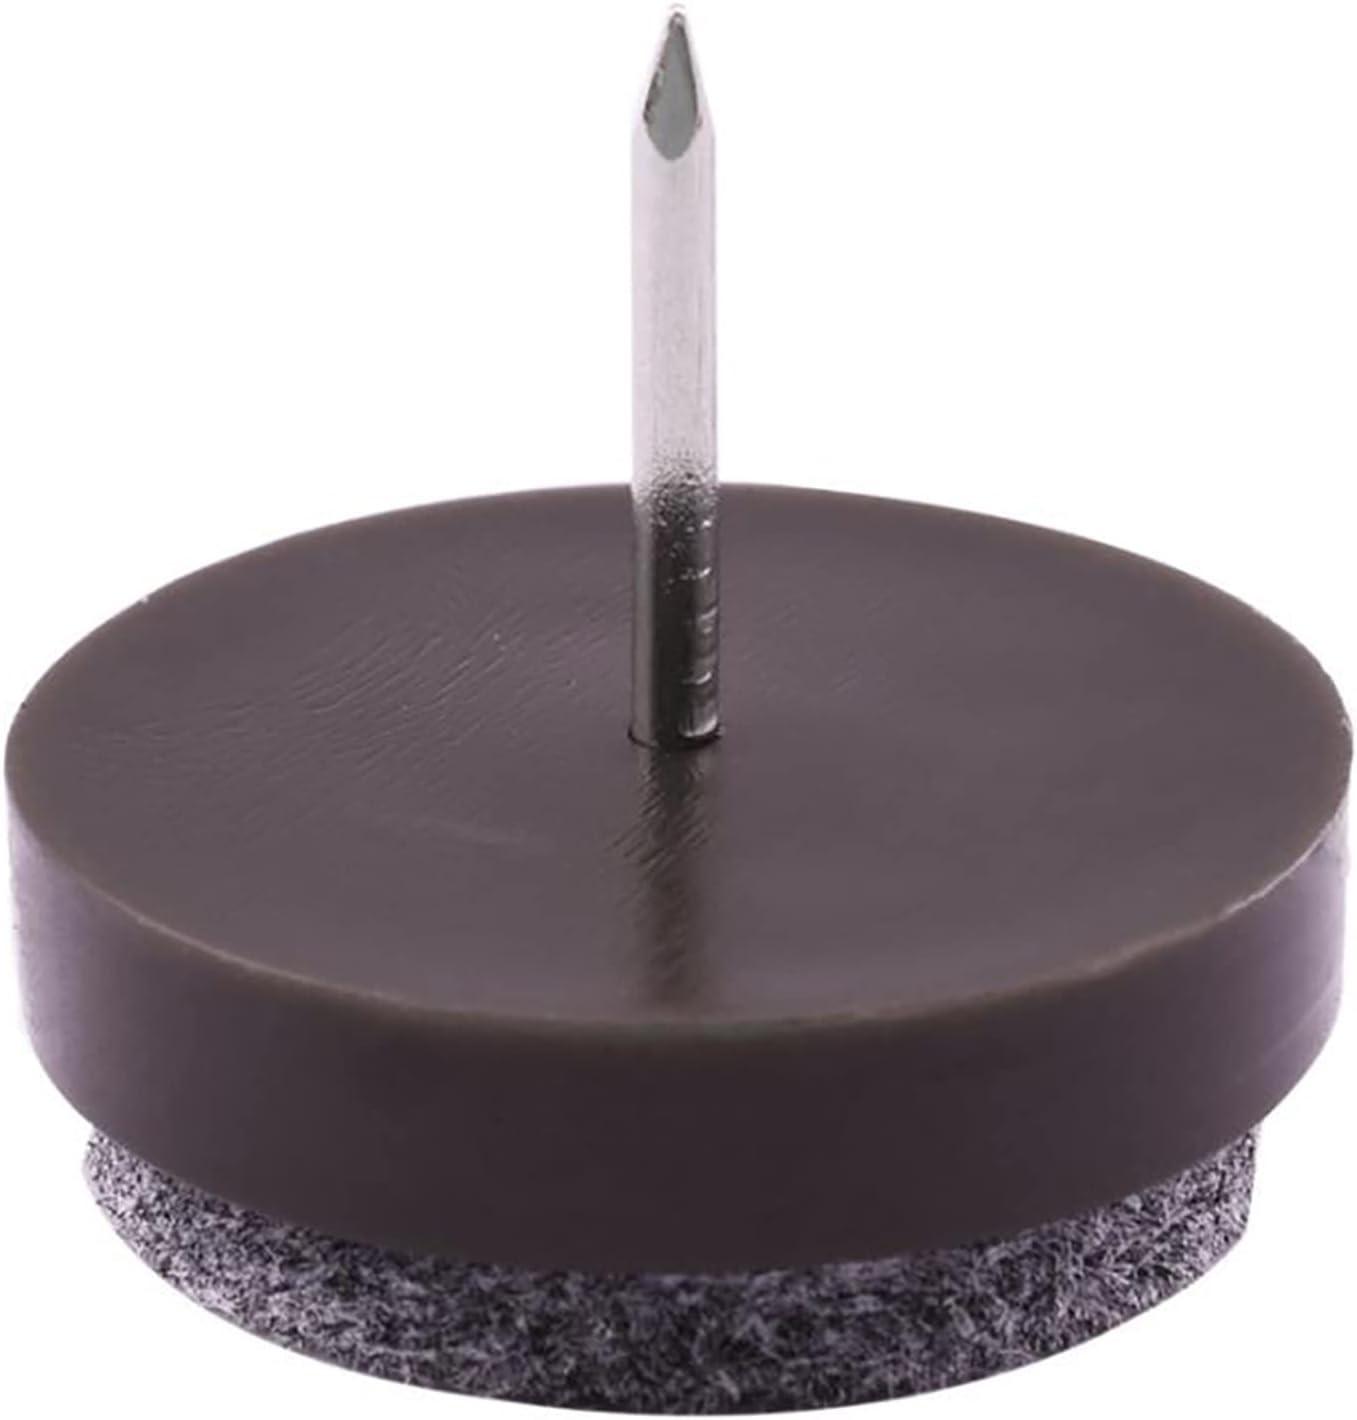 qfkj Furniture Cup 5 10 Surprise price 20 Felt Pads New popularity Nails f Floor Pcs